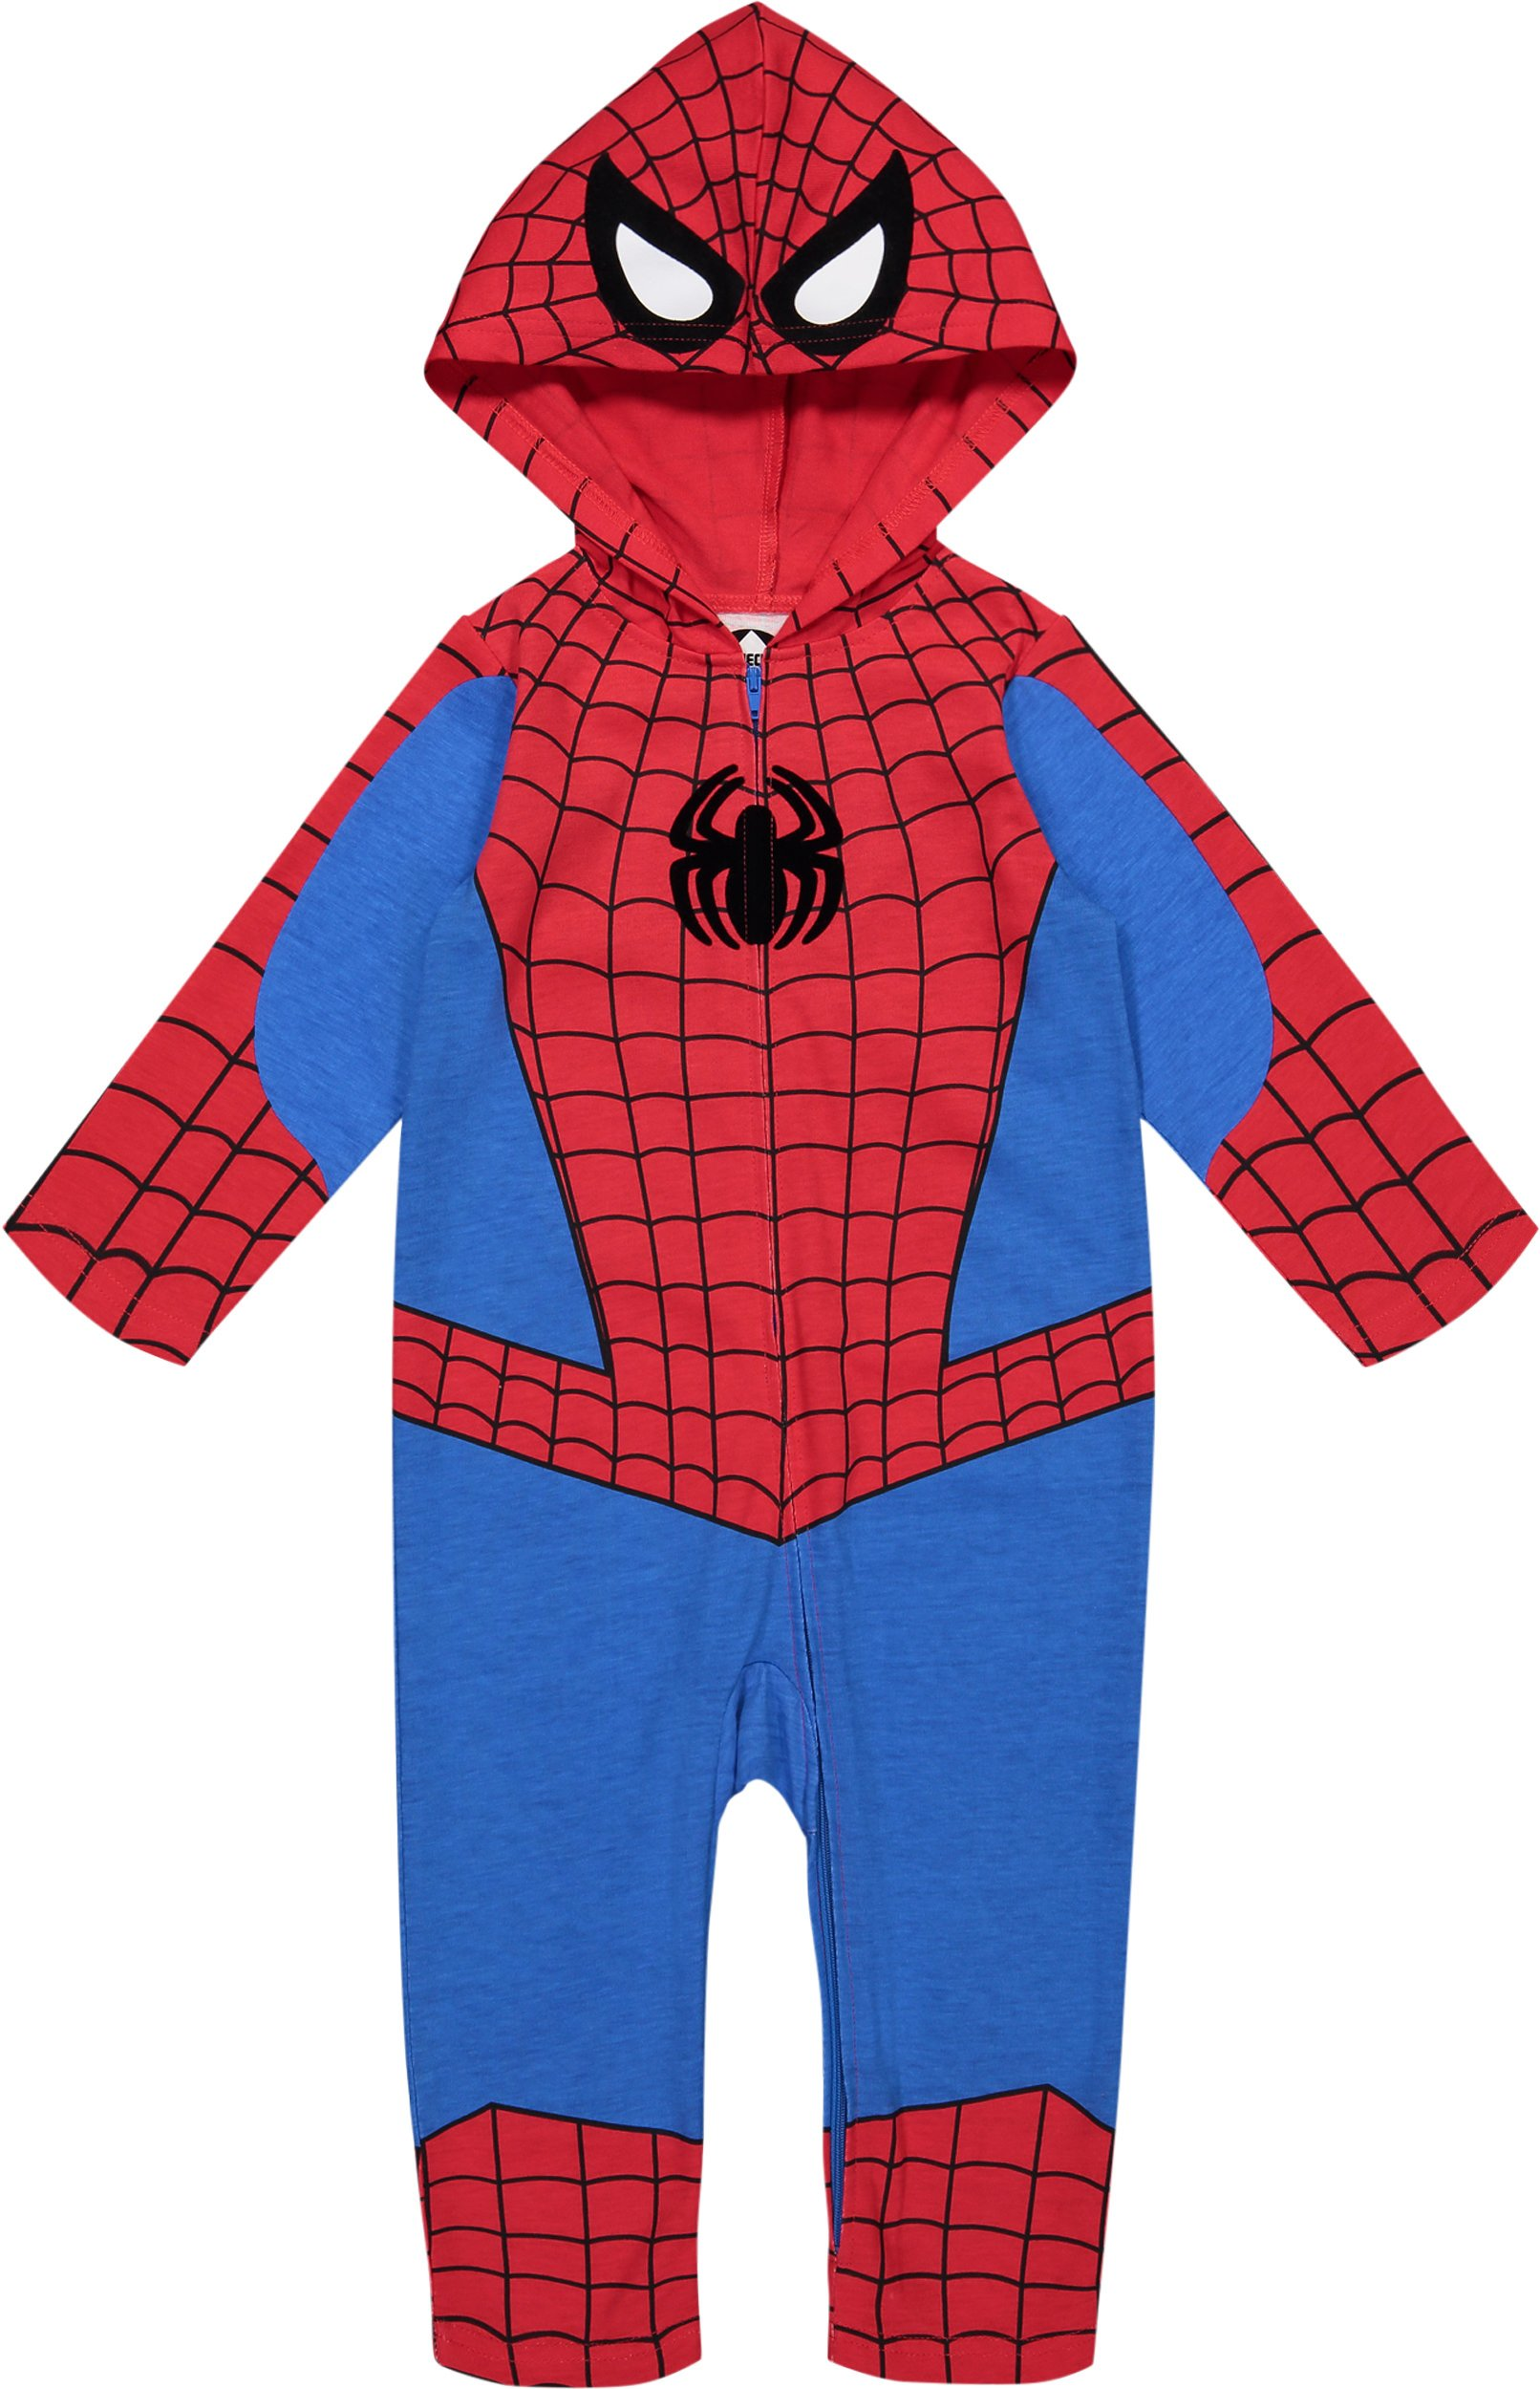 Marvel Avengers Spiderman Toddler Boys' Zip-Up Hooded Costume Coverall (3T)